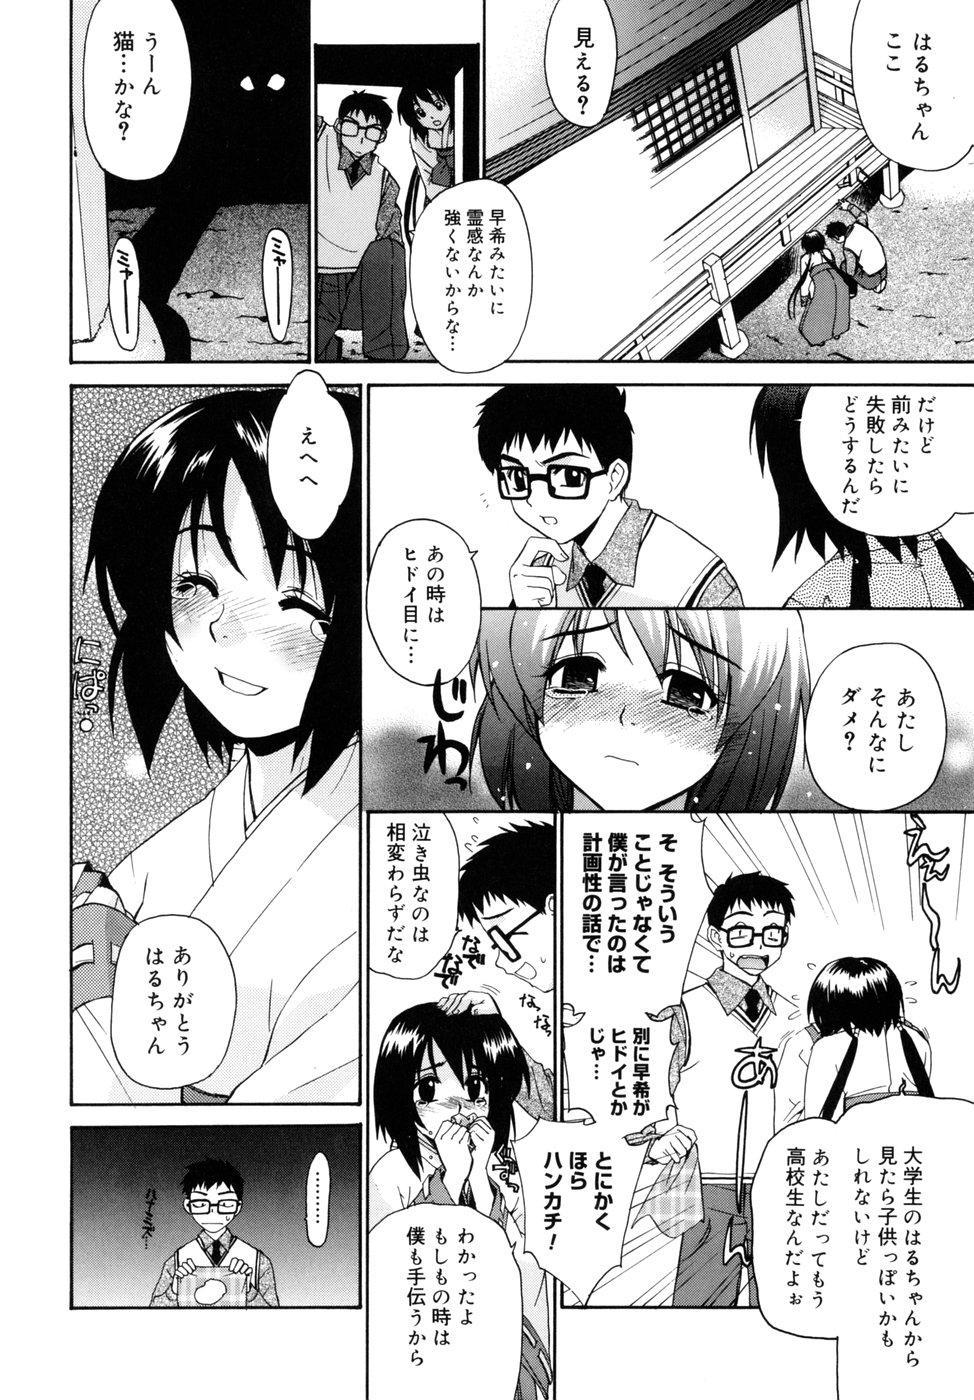 [Yaya Hinata] Tonari no Miko-san wa Minna Warau - The next shrine maidens smile in everyone. 7